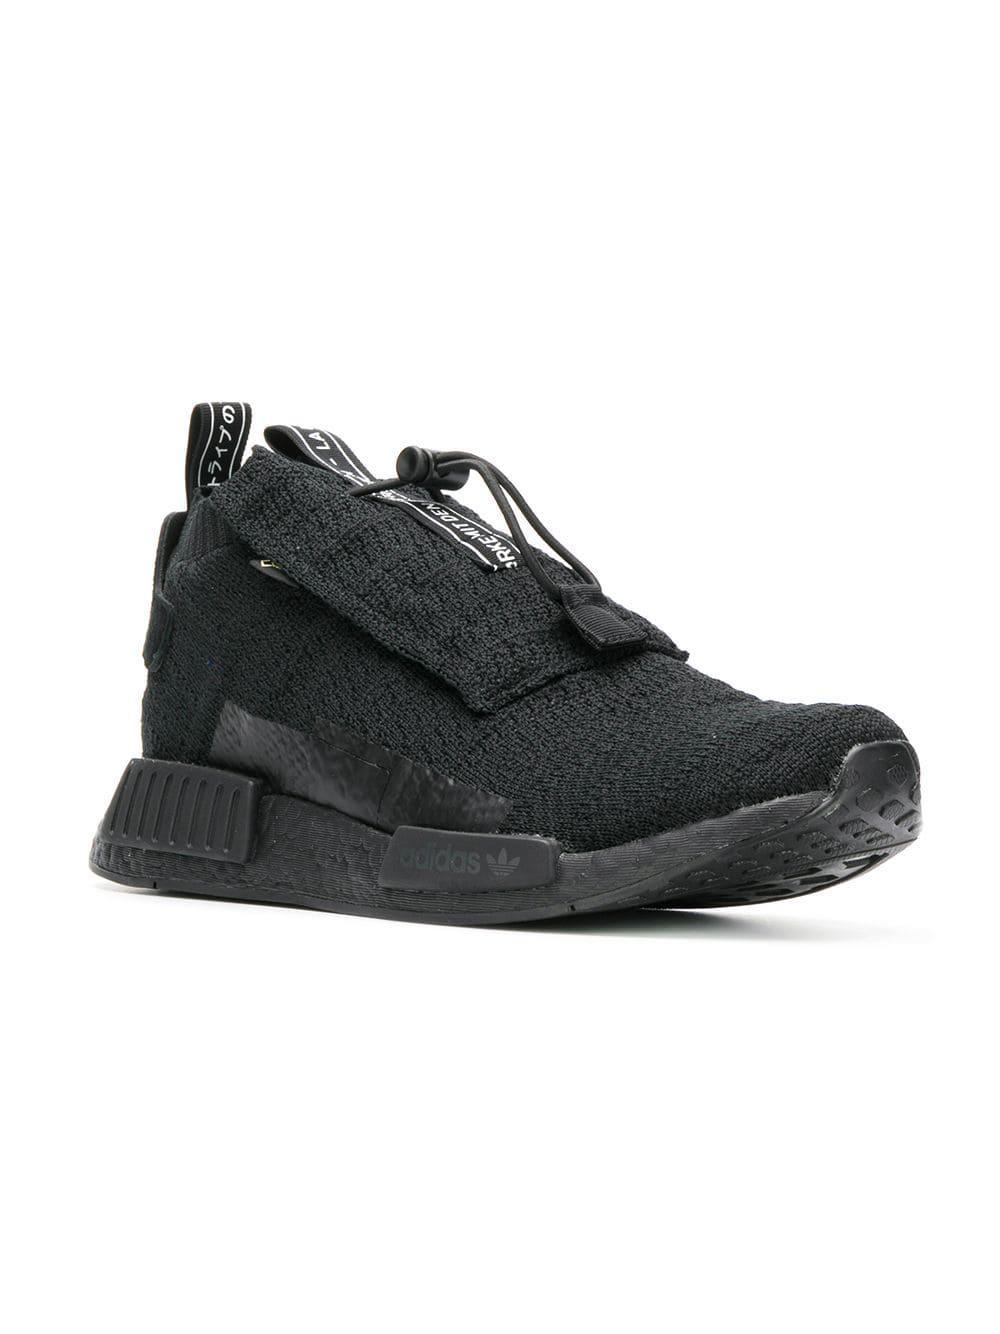 12374ad684b5d Lyst - adidas Black Nmd Ts1 Pk Gore-tex Primeknit Sneakers in Black for Men